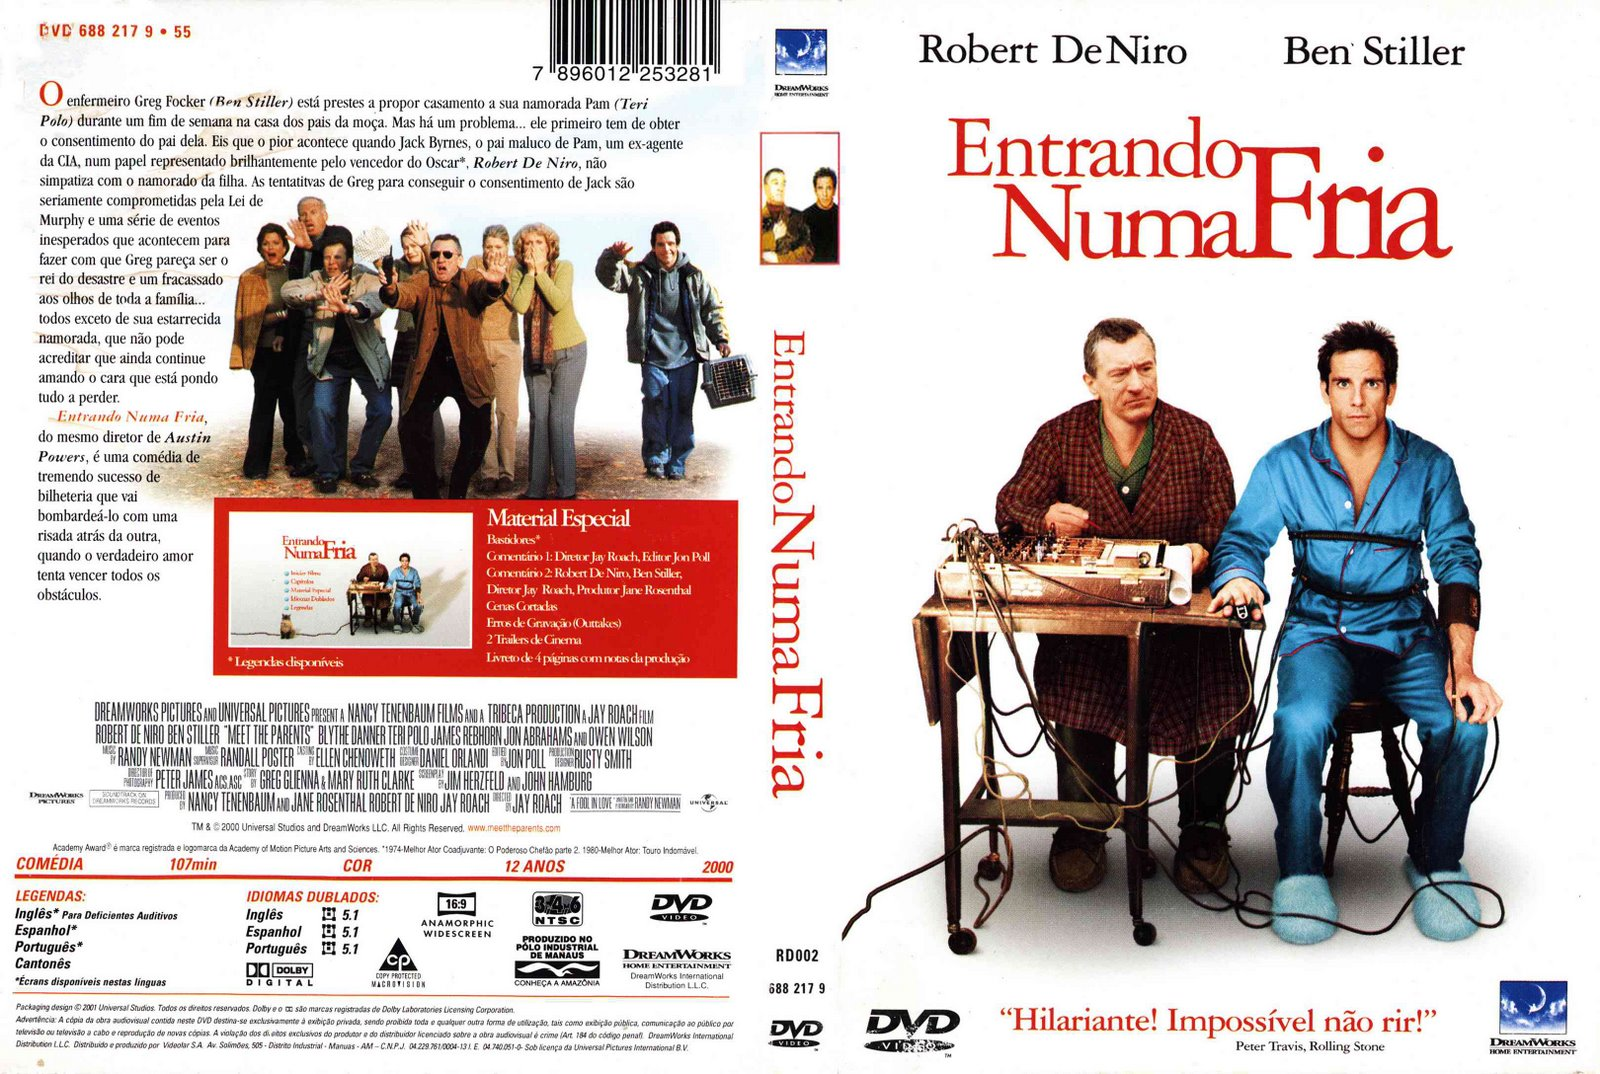 http://2.bp.blogspot.com/_f_UeDPtuh5I/TO8fNcpTJHI/AAAAAAAAAHU/OPeau5oz9Og/s1600/Entrando_Numa_Fria-comedia.jpg